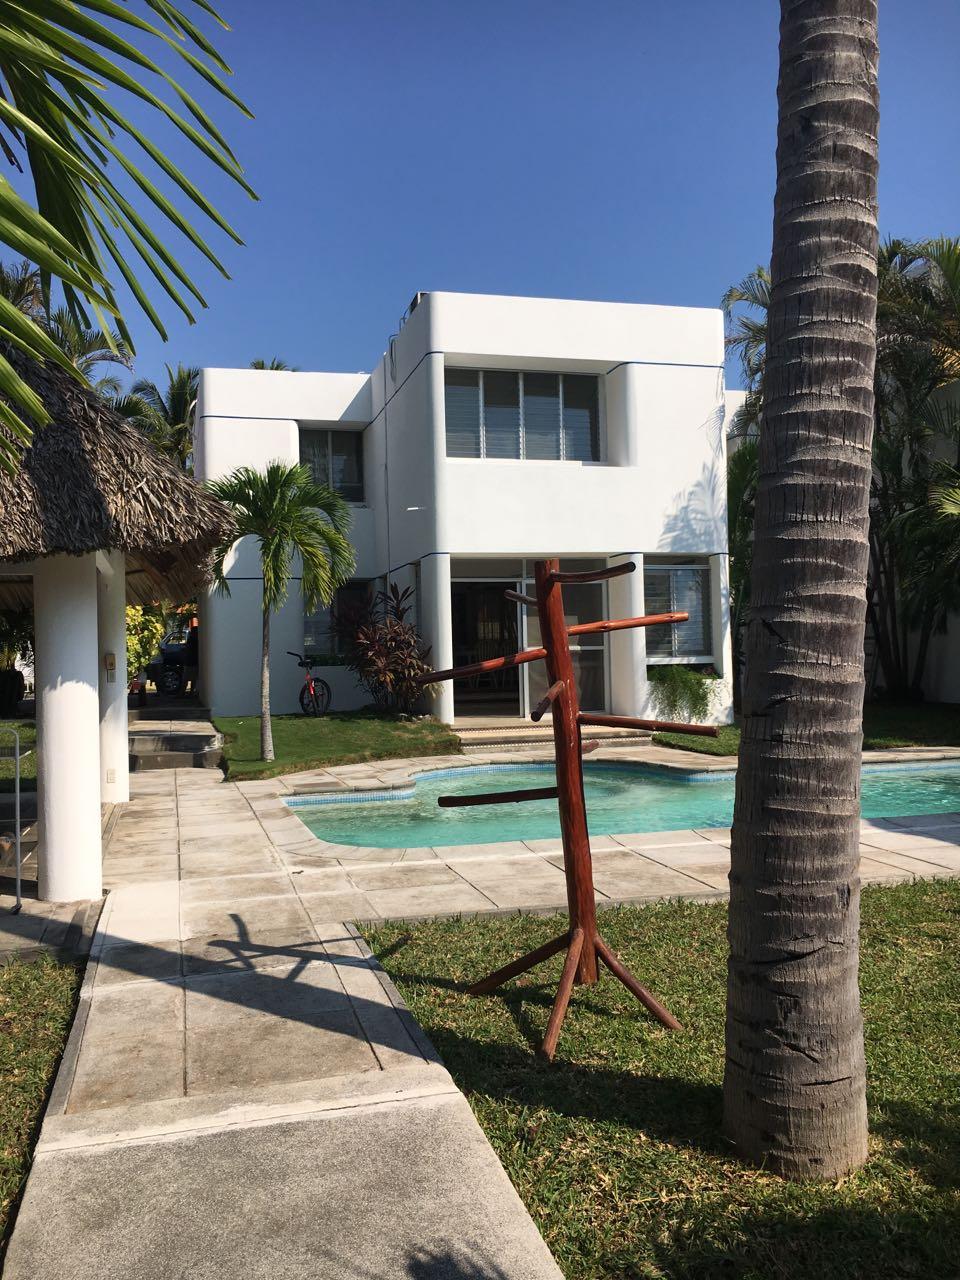 likin casa en en alquiler US$1,300.00 mensuales